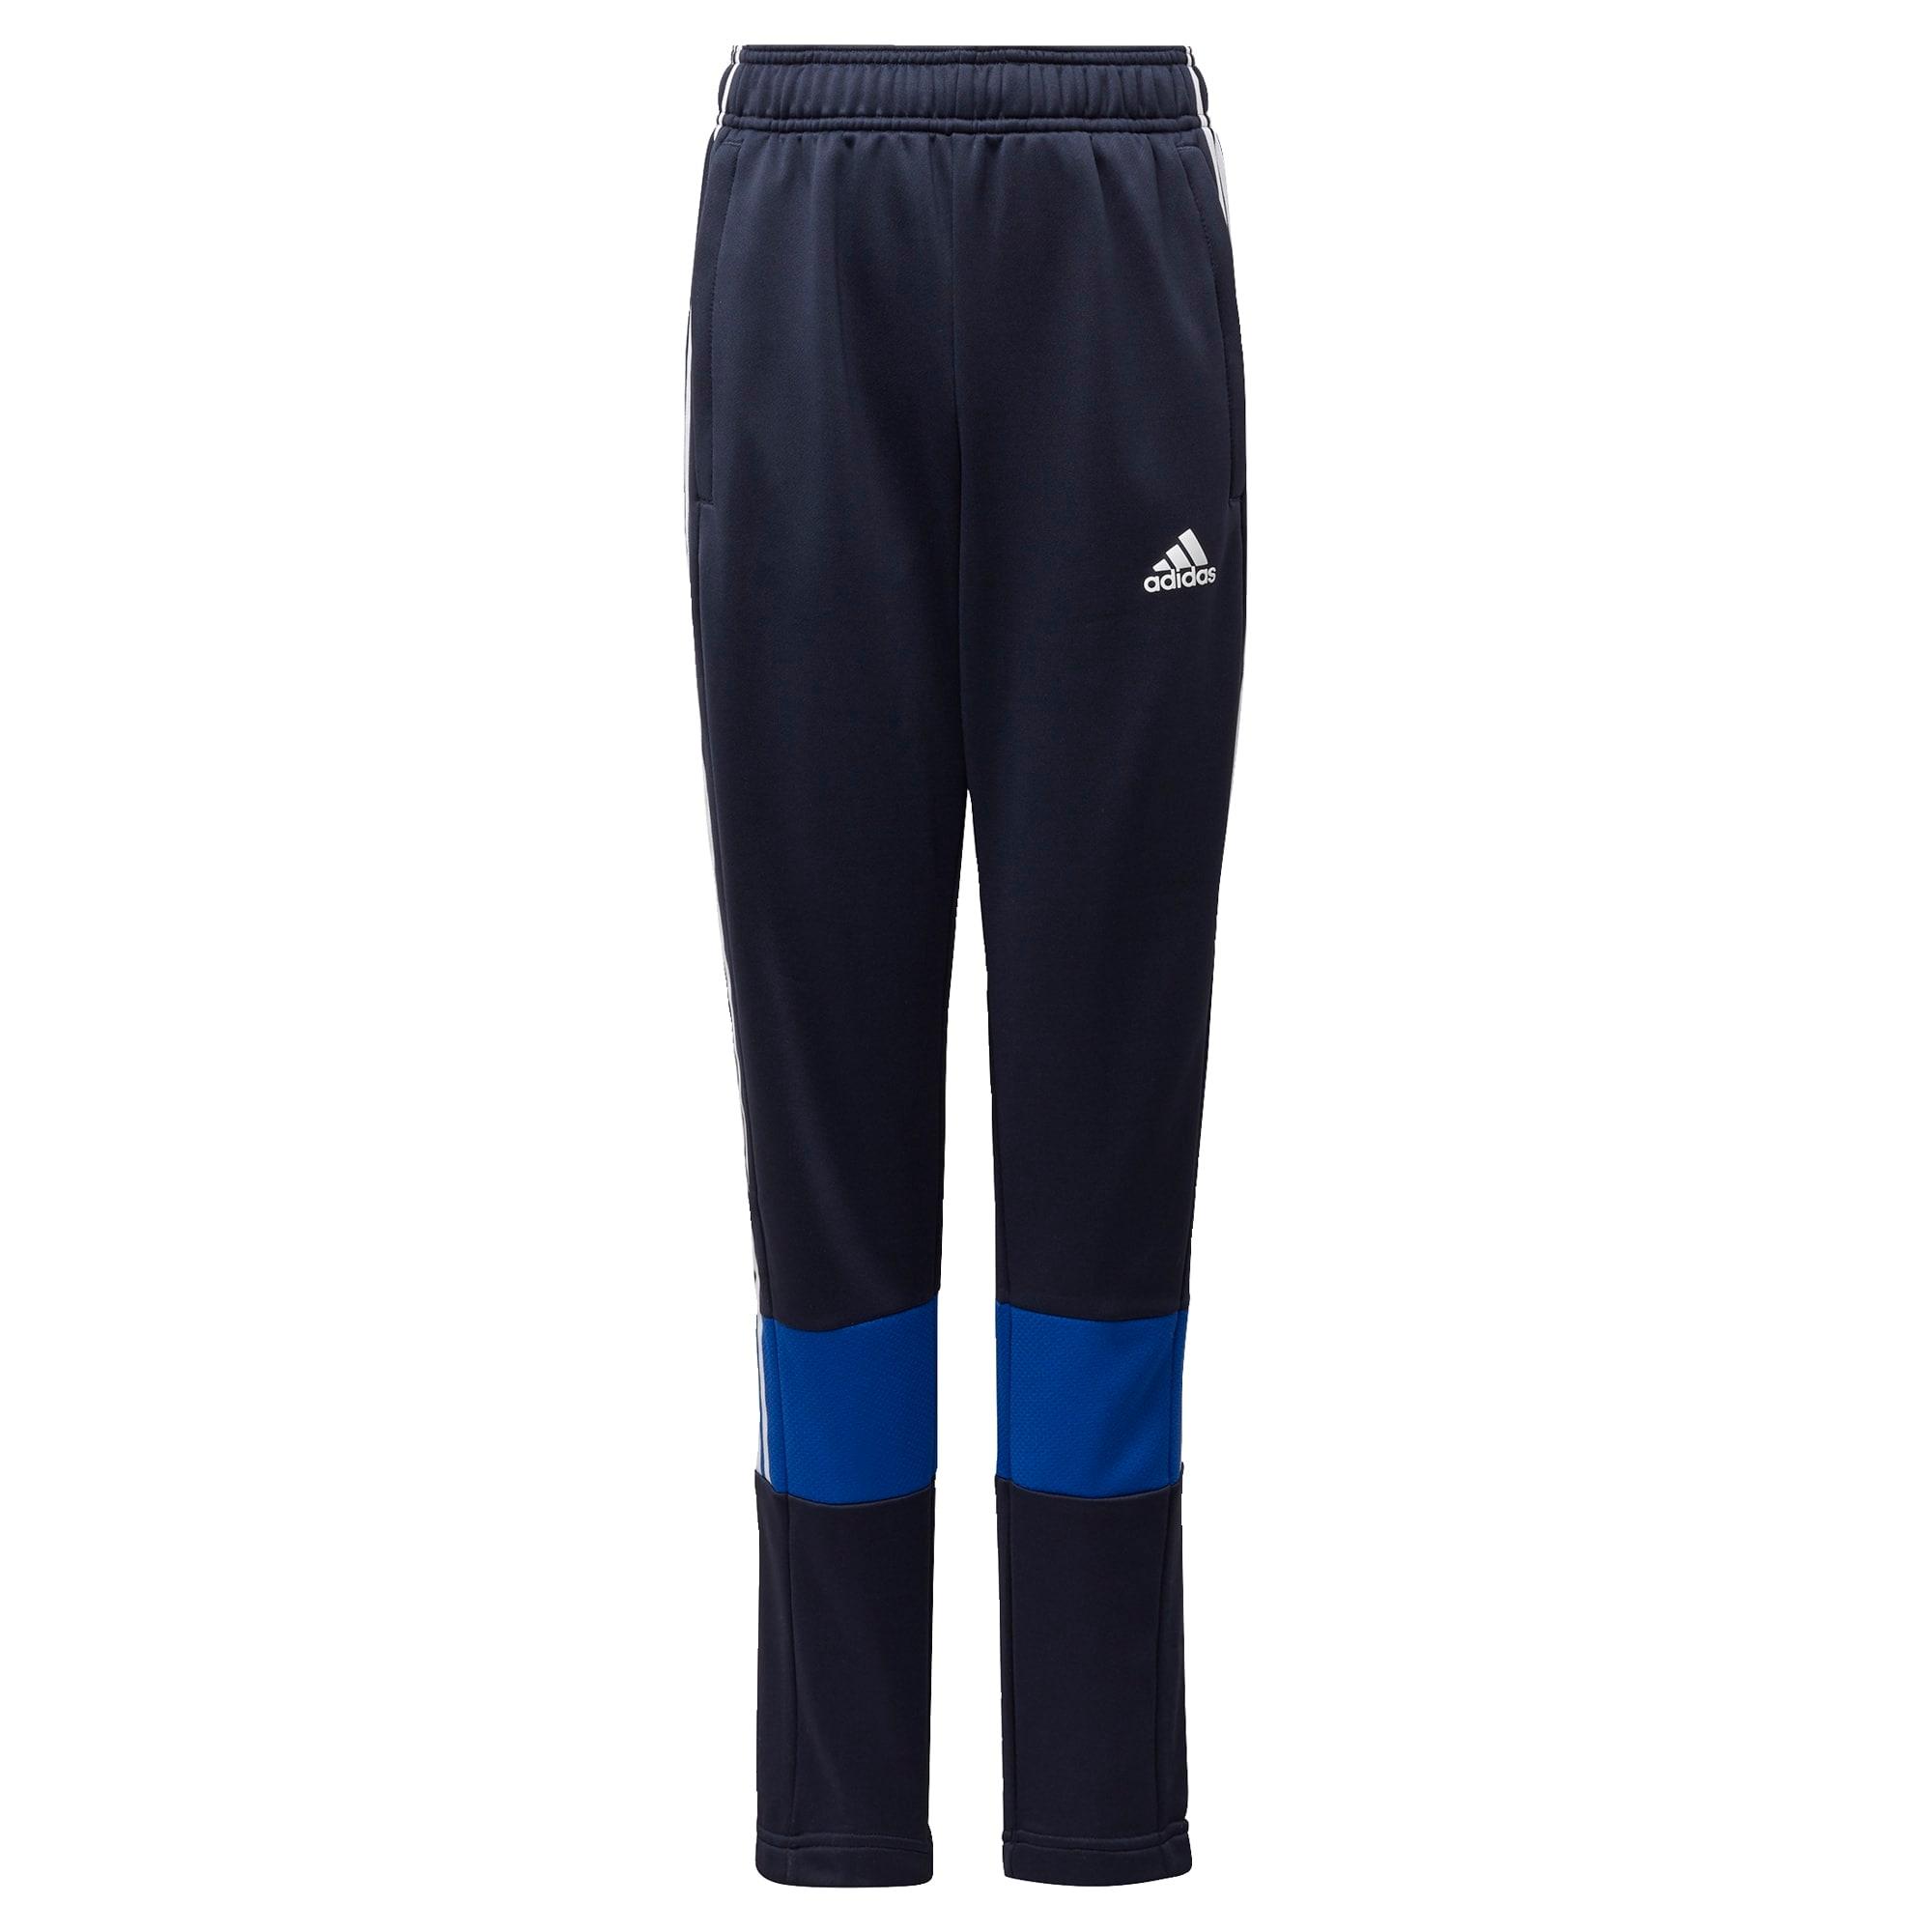 ADIDAS PERFORMANCE Sportinės kelnės 'B A.R.' balta / mėlyna / nakties mėlyna